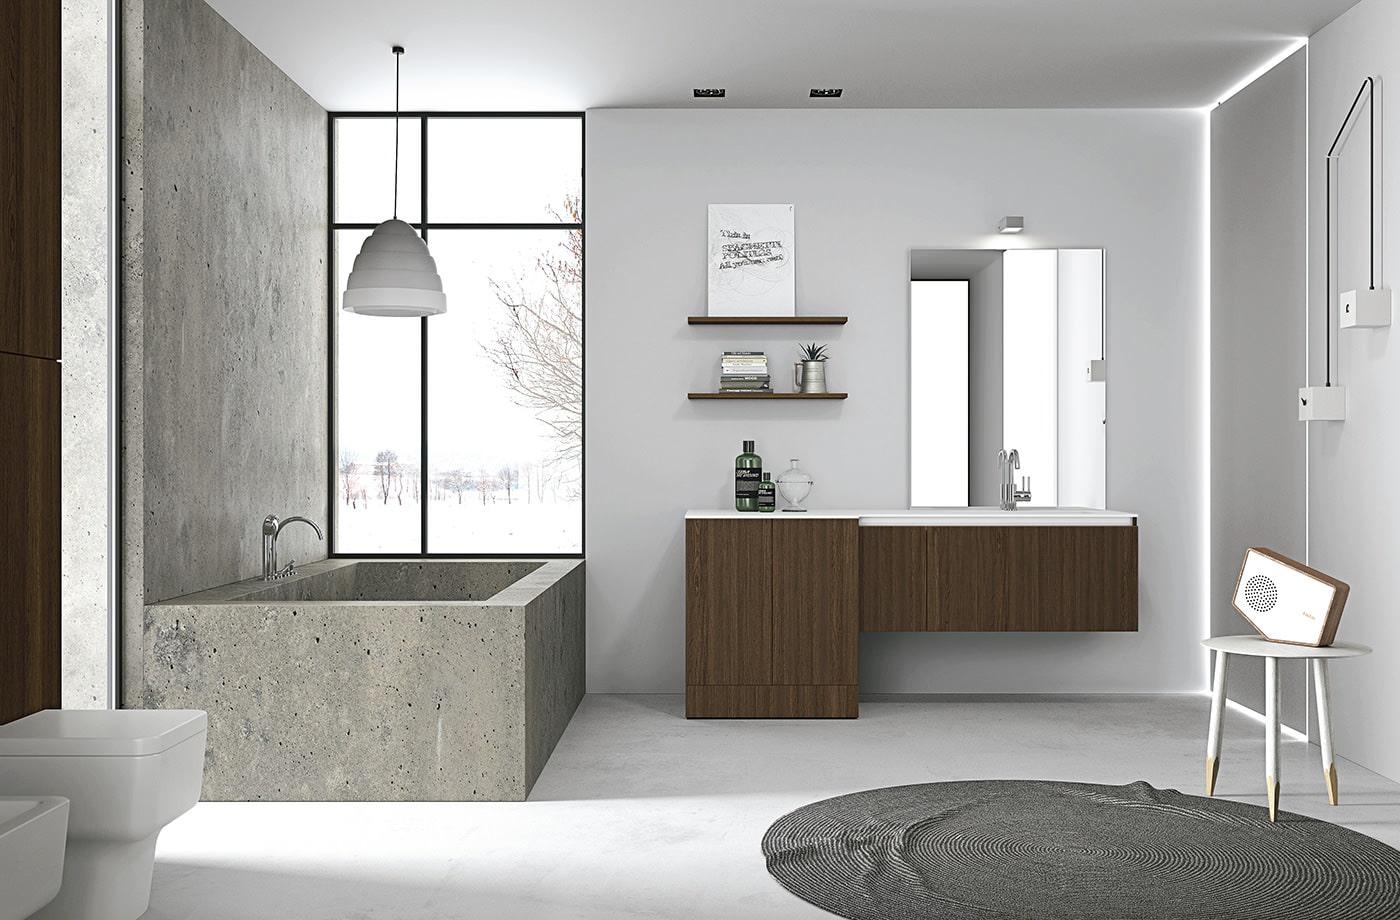 stil minimalizm v vannoj komnate osobennosti foto7 - Идеи и советы для ремонта в ванной комнате